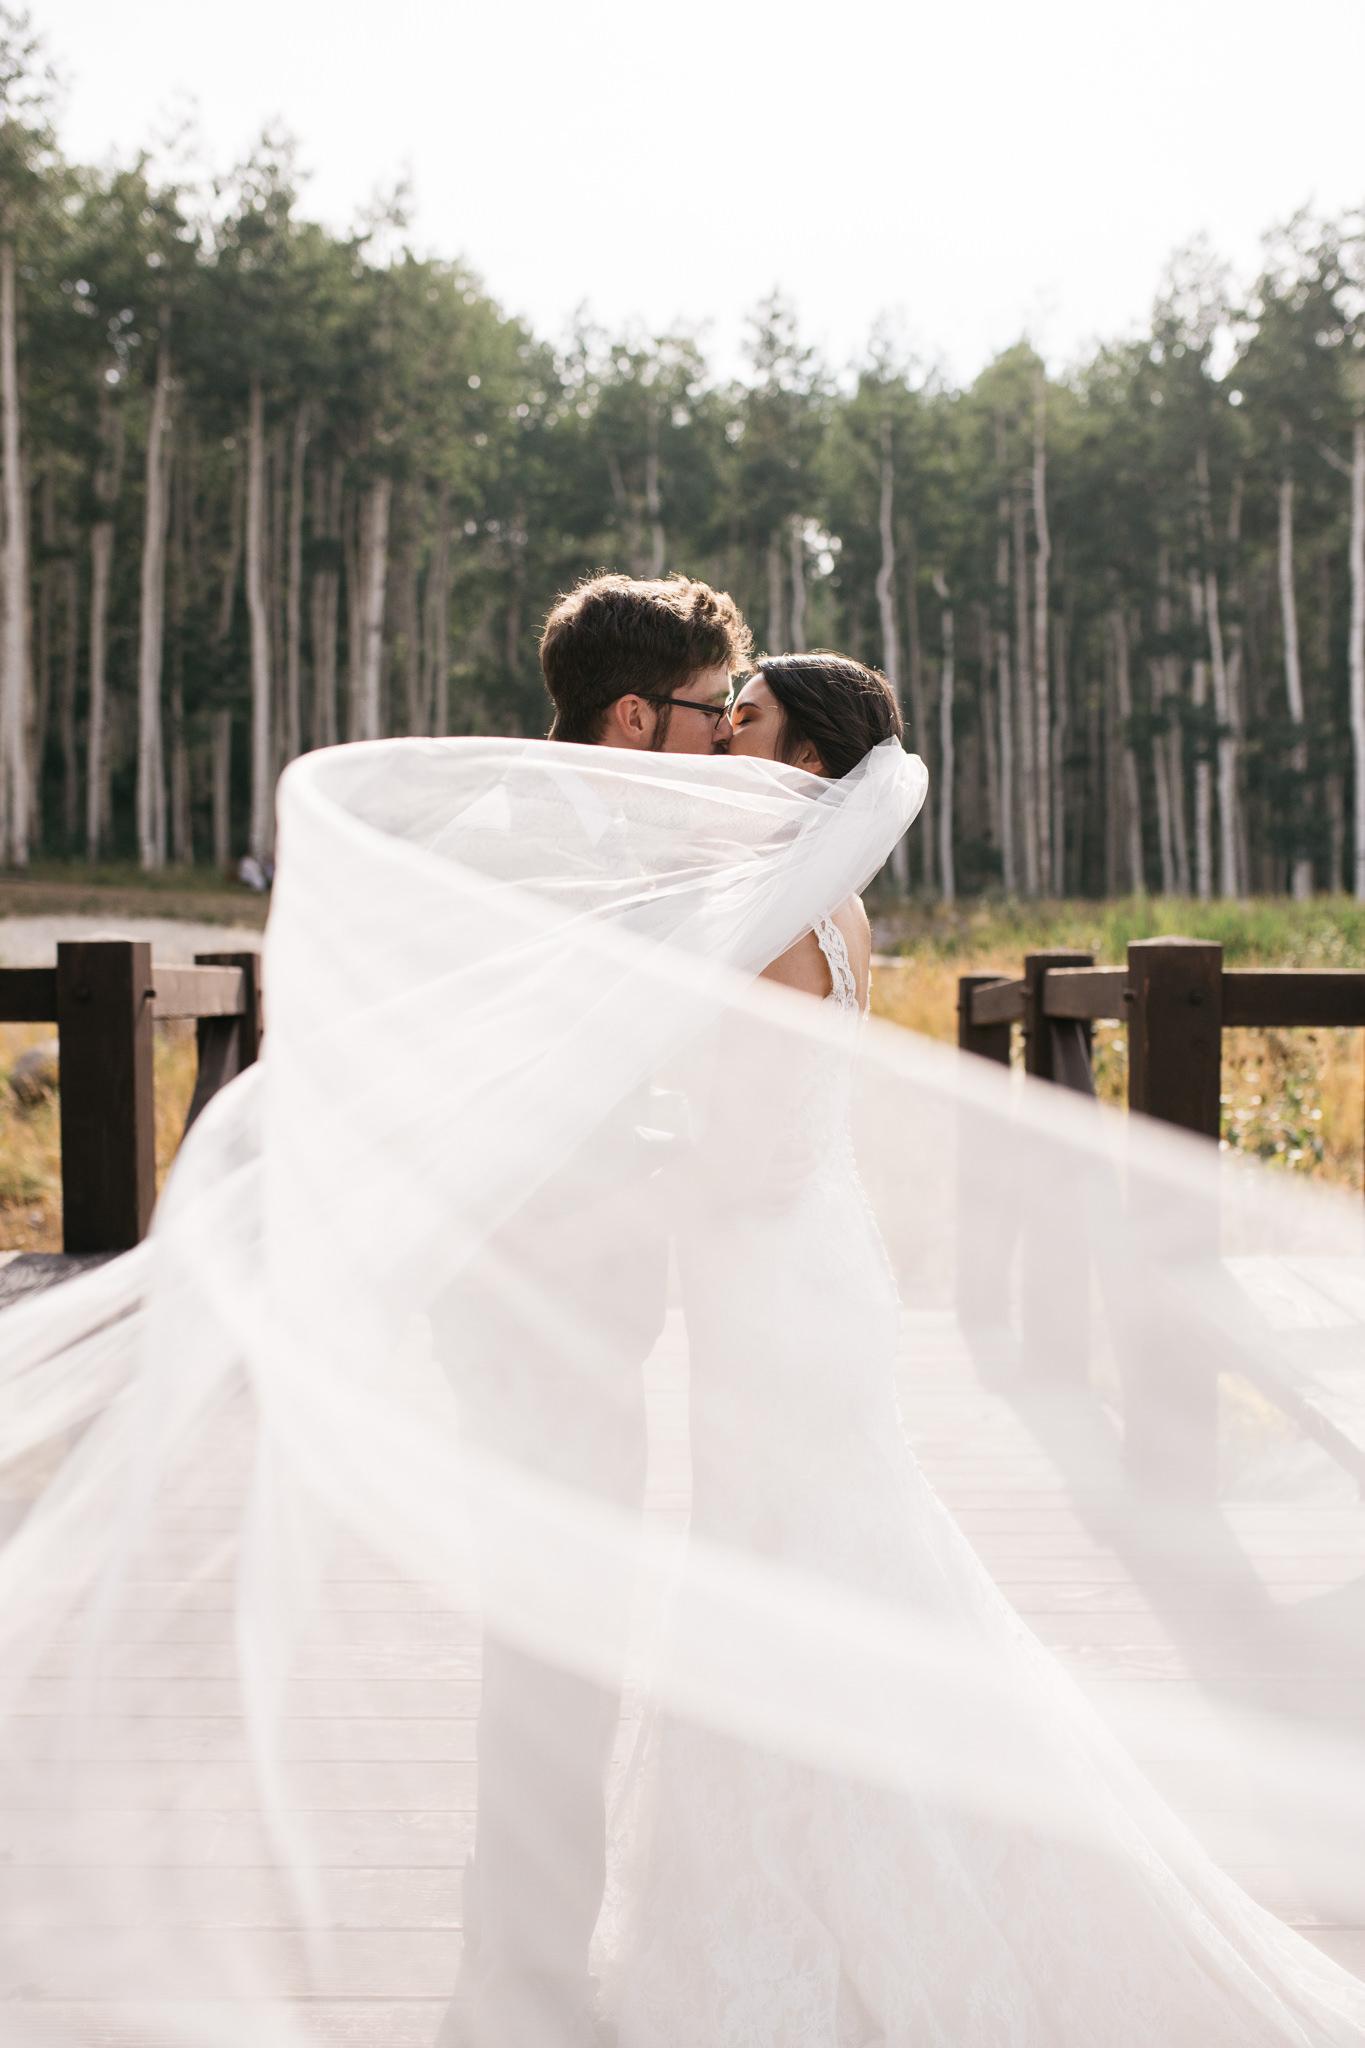 365_ONL_Kat_Nick_Wedding_Trevor_Hooper_Photo.jpg